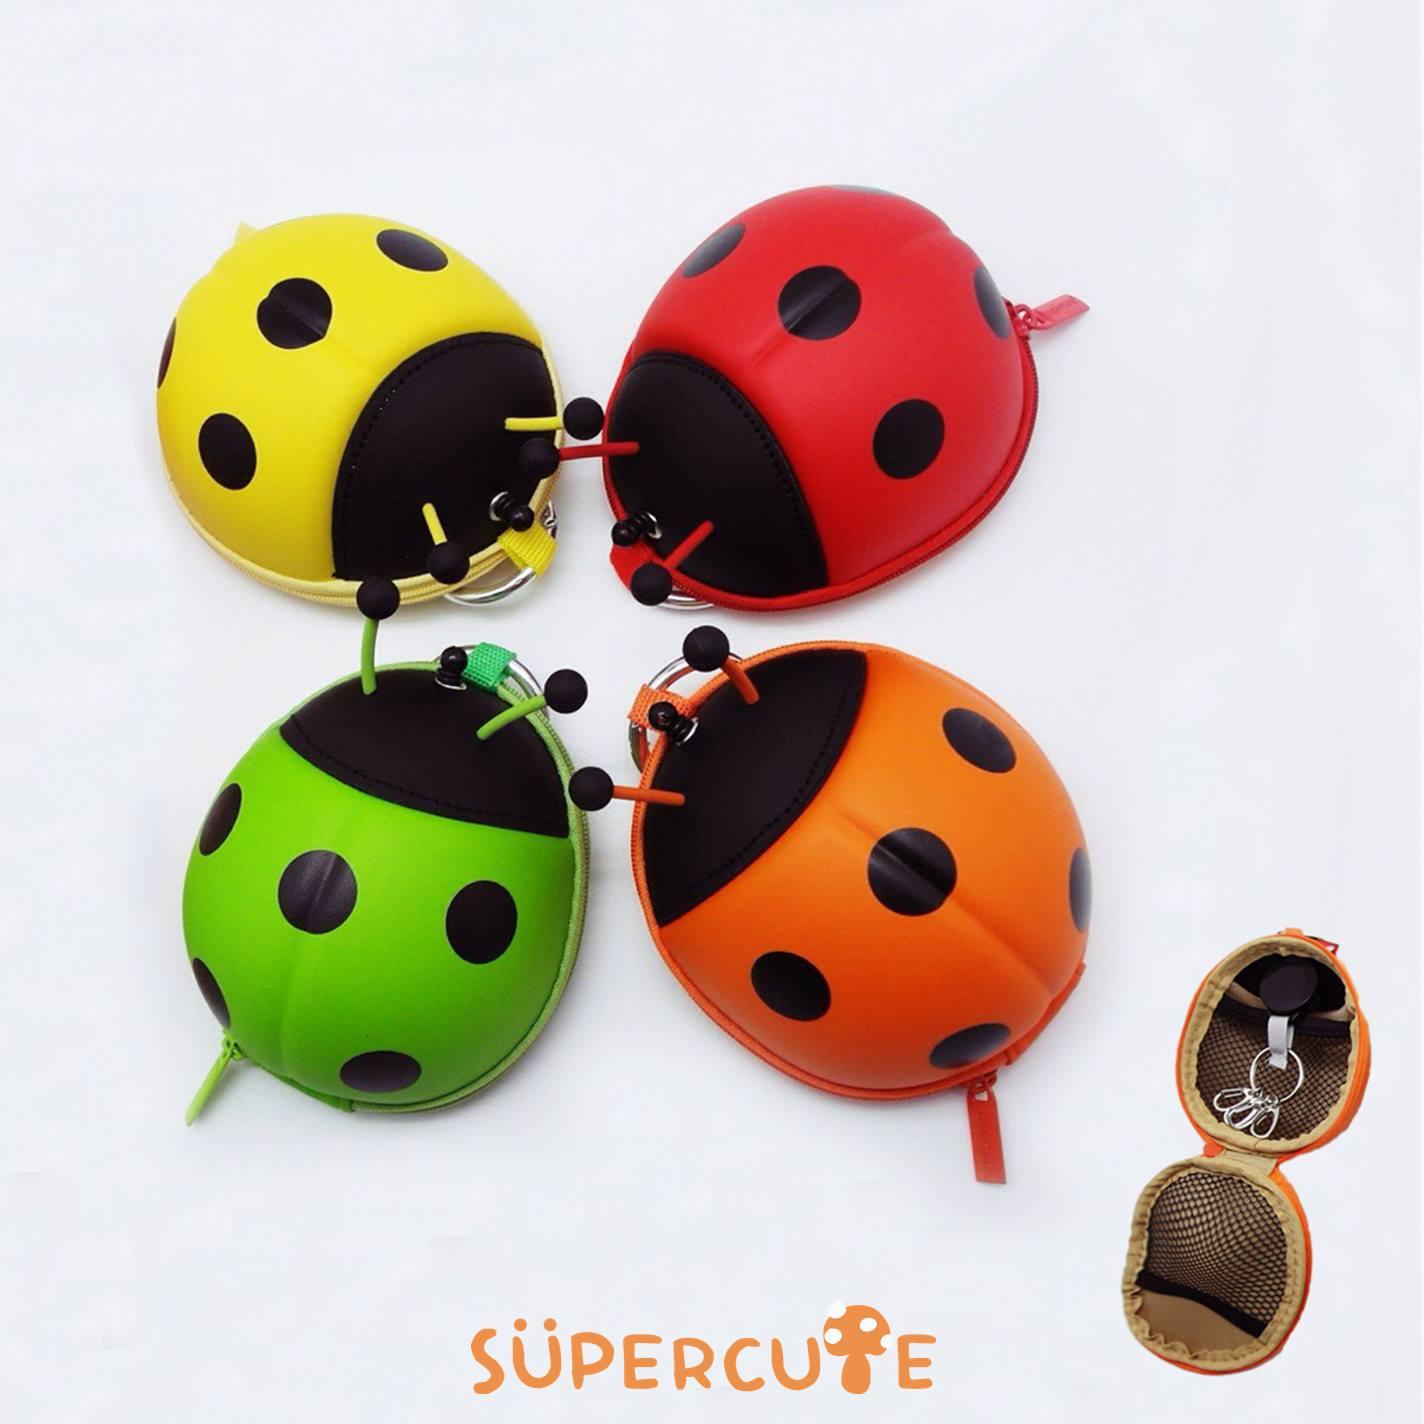 Supercute 飄蟲收納卡包^(四色^)